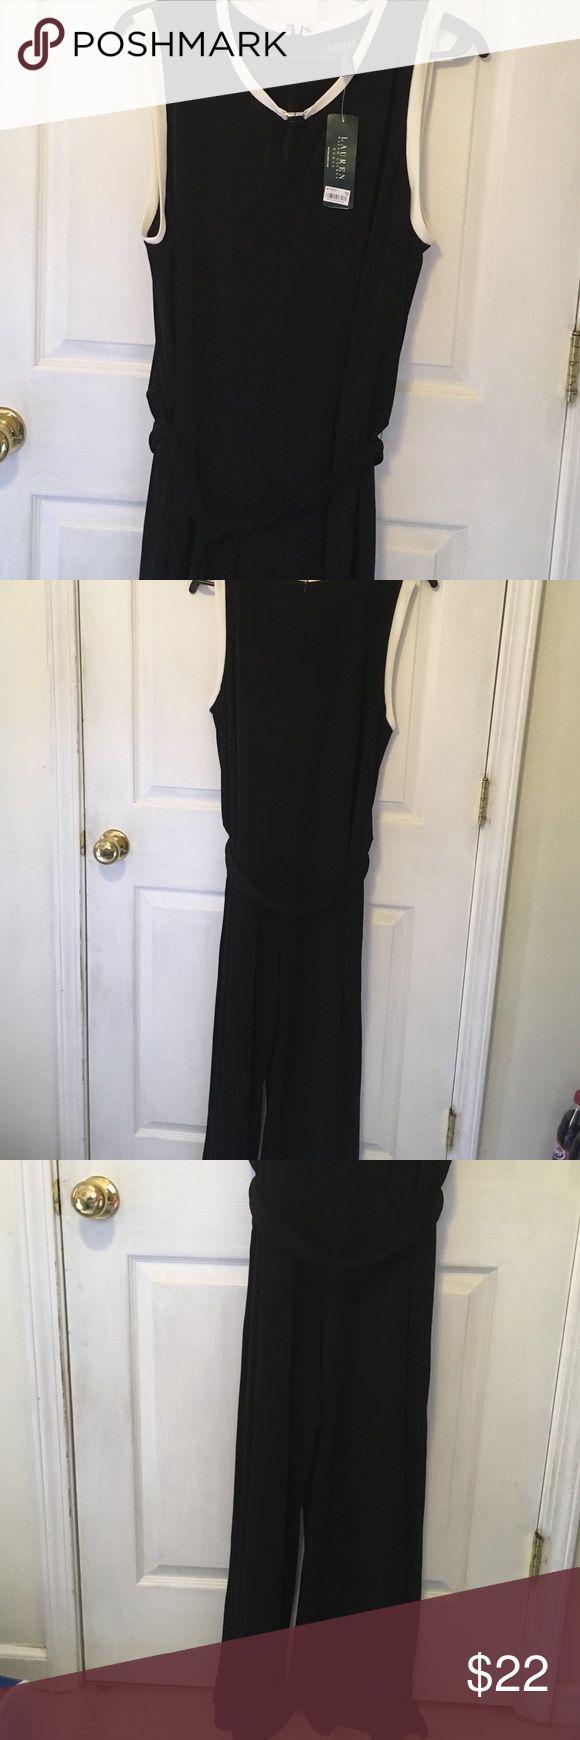 New black and white Ralph Lauren jumpsuit New Ralph Lauren black and white jumpsuit Lauren Ralph Lauren Other